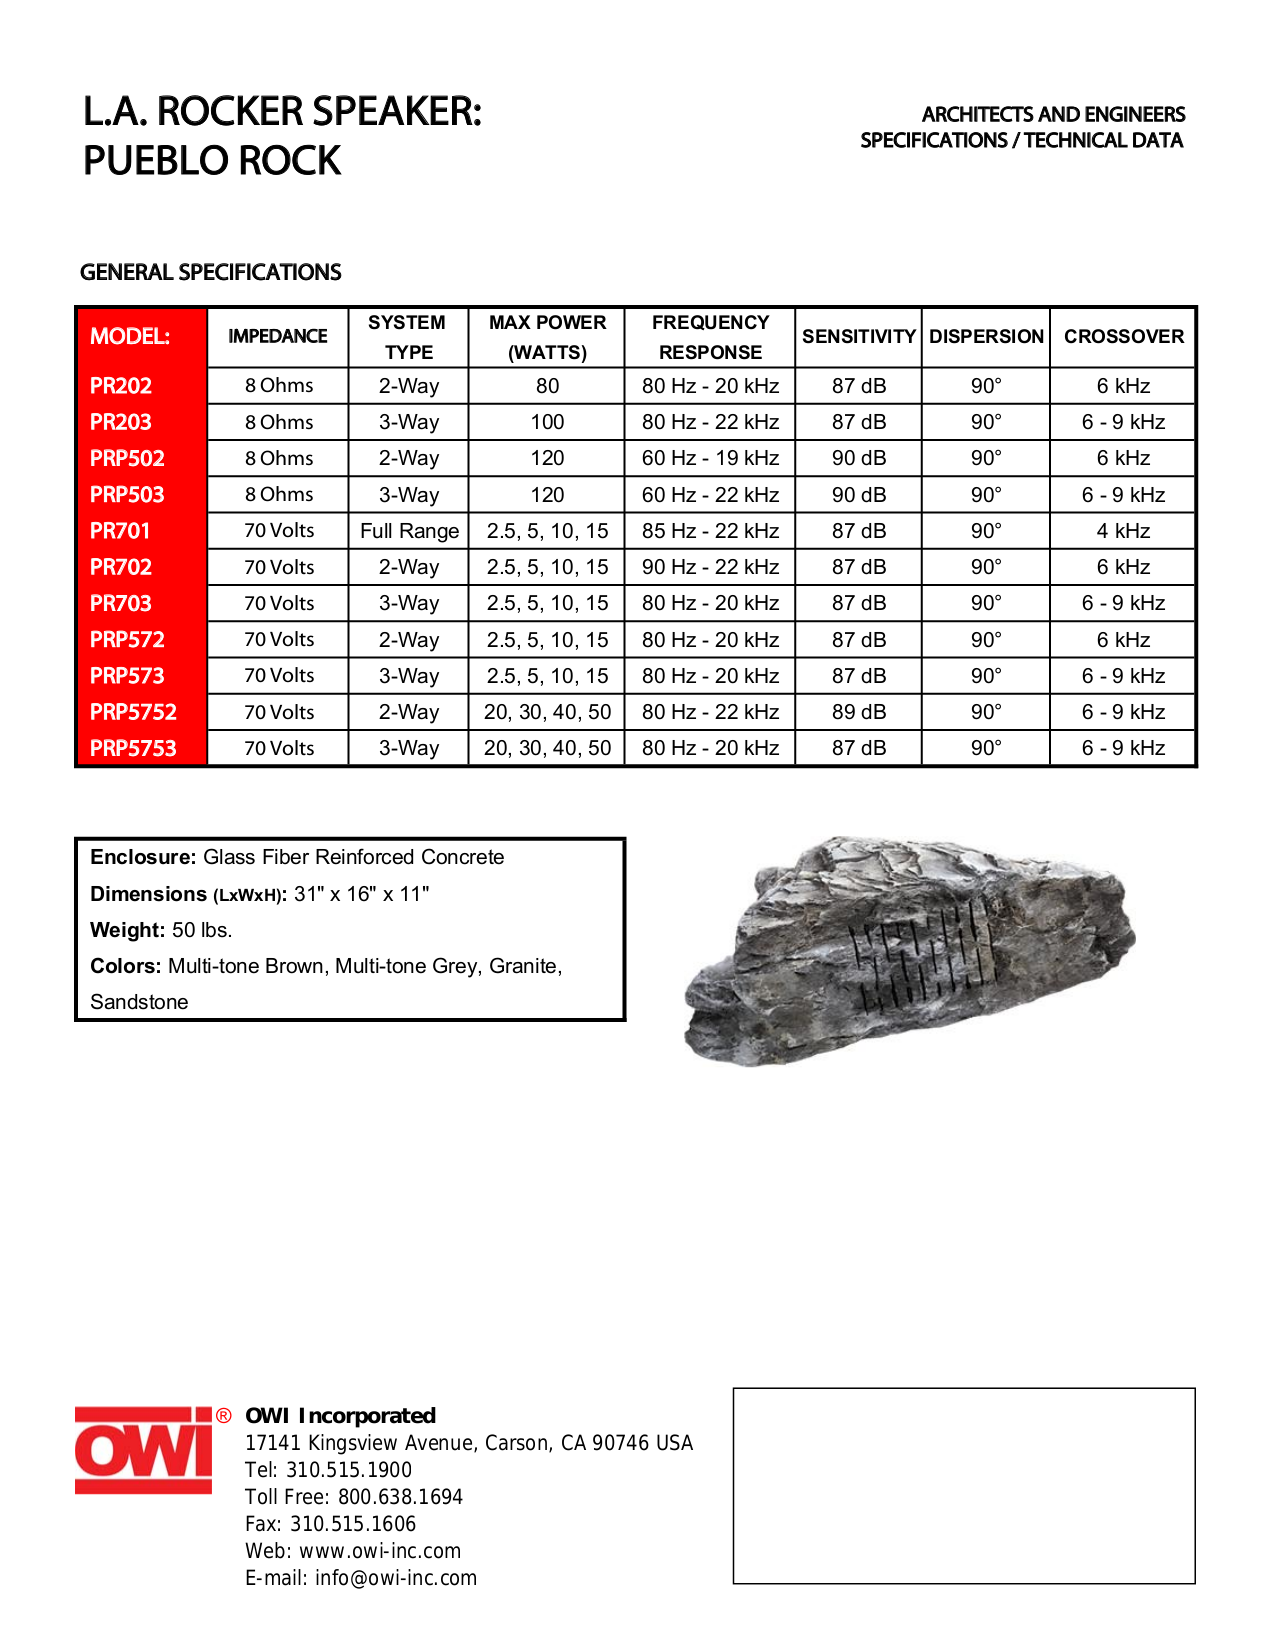 pdf for Owi Speaker PR701 manual